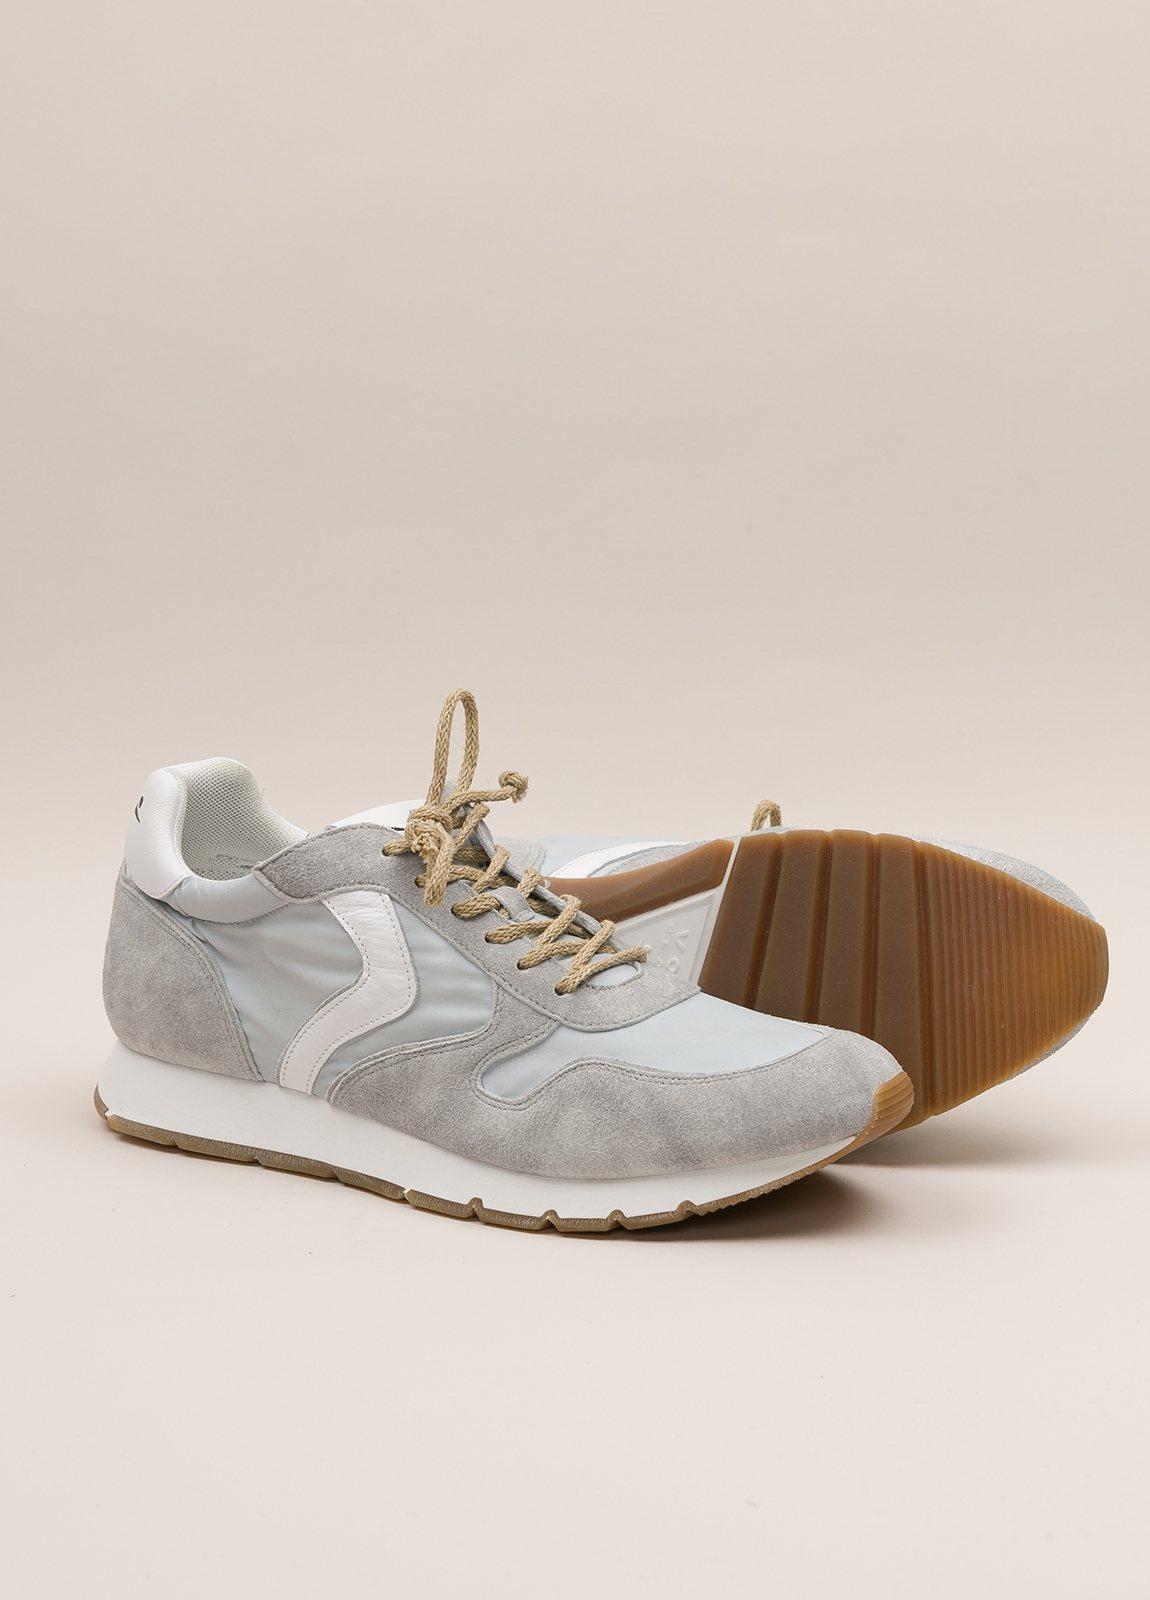 Zapatillas casual VOILE BLANCHE gris claro - Ítem3